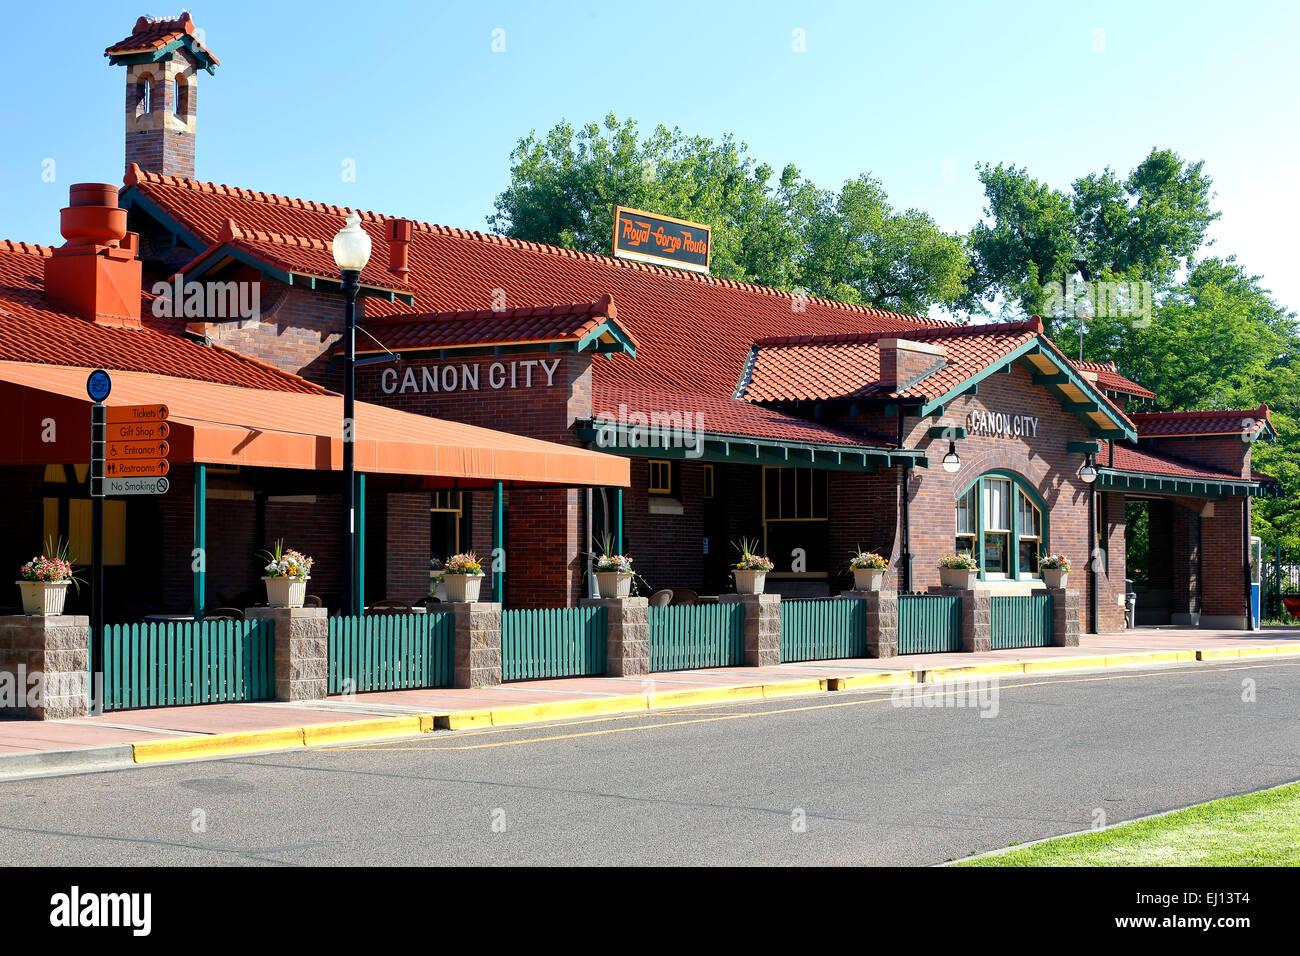 Santa Fe Depot, home of Royal Gorge Route Railroad, Canon City, Colorado USA - Stock Image